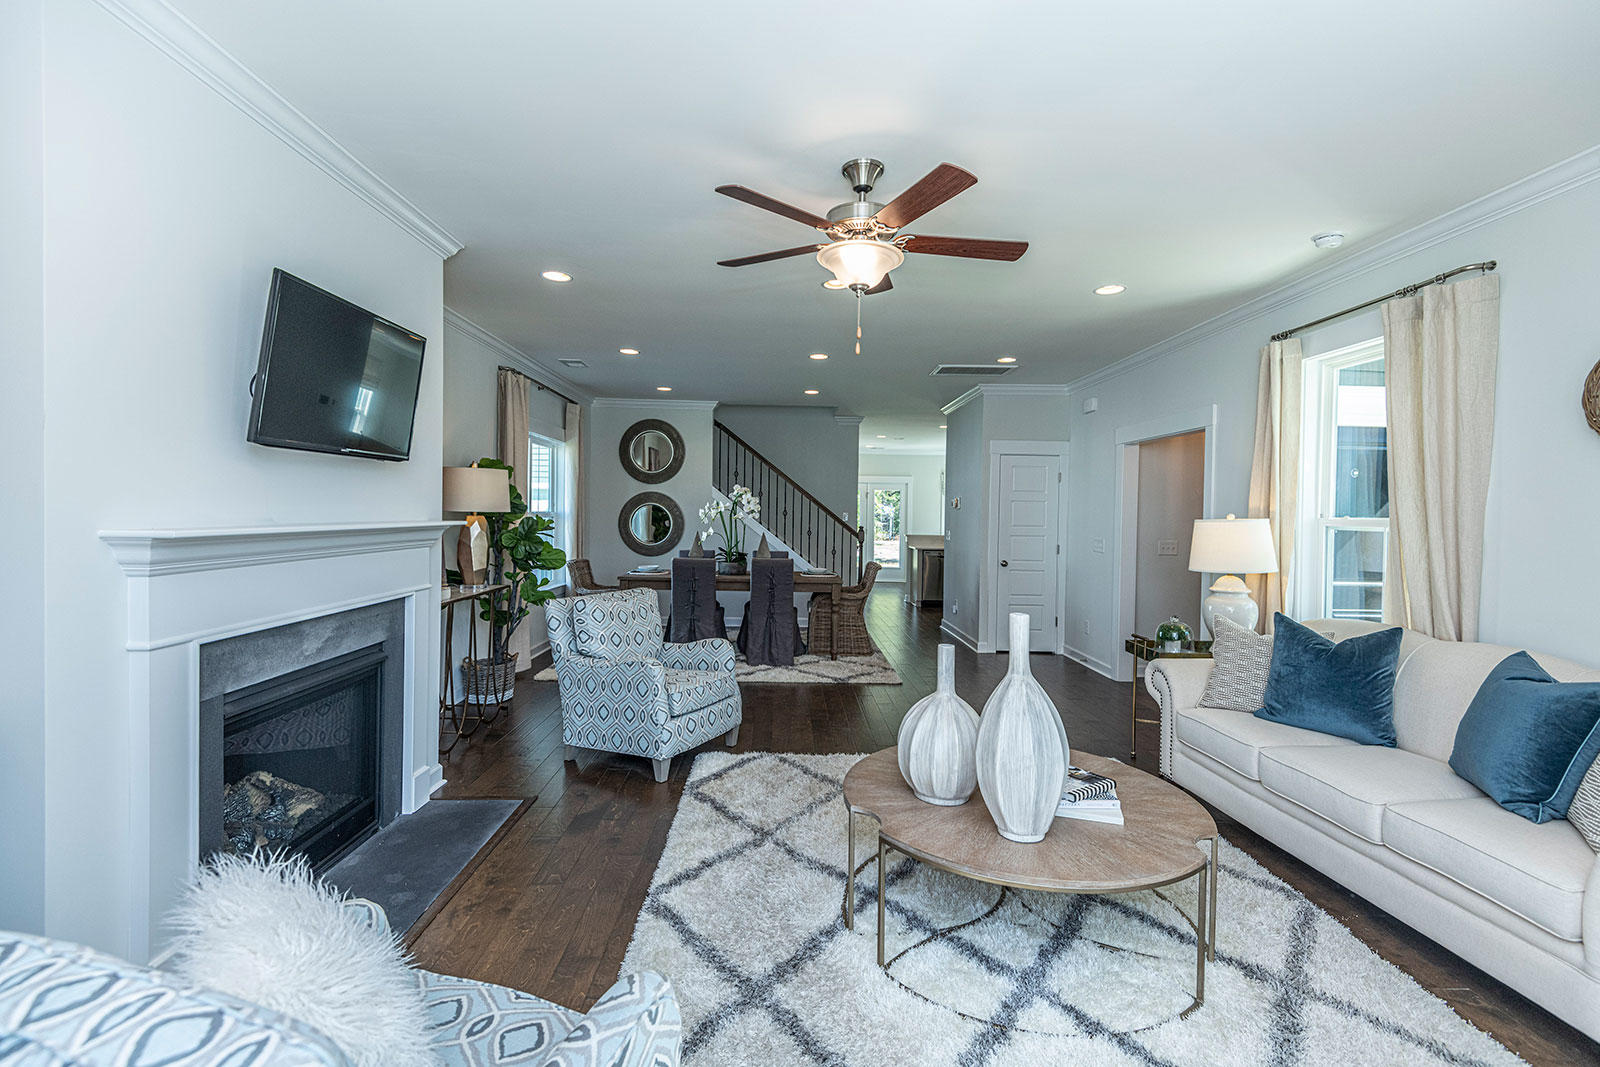 Church Creek Landing Homes For Sale - 2302 Town Woods, Charleston, SC - 0